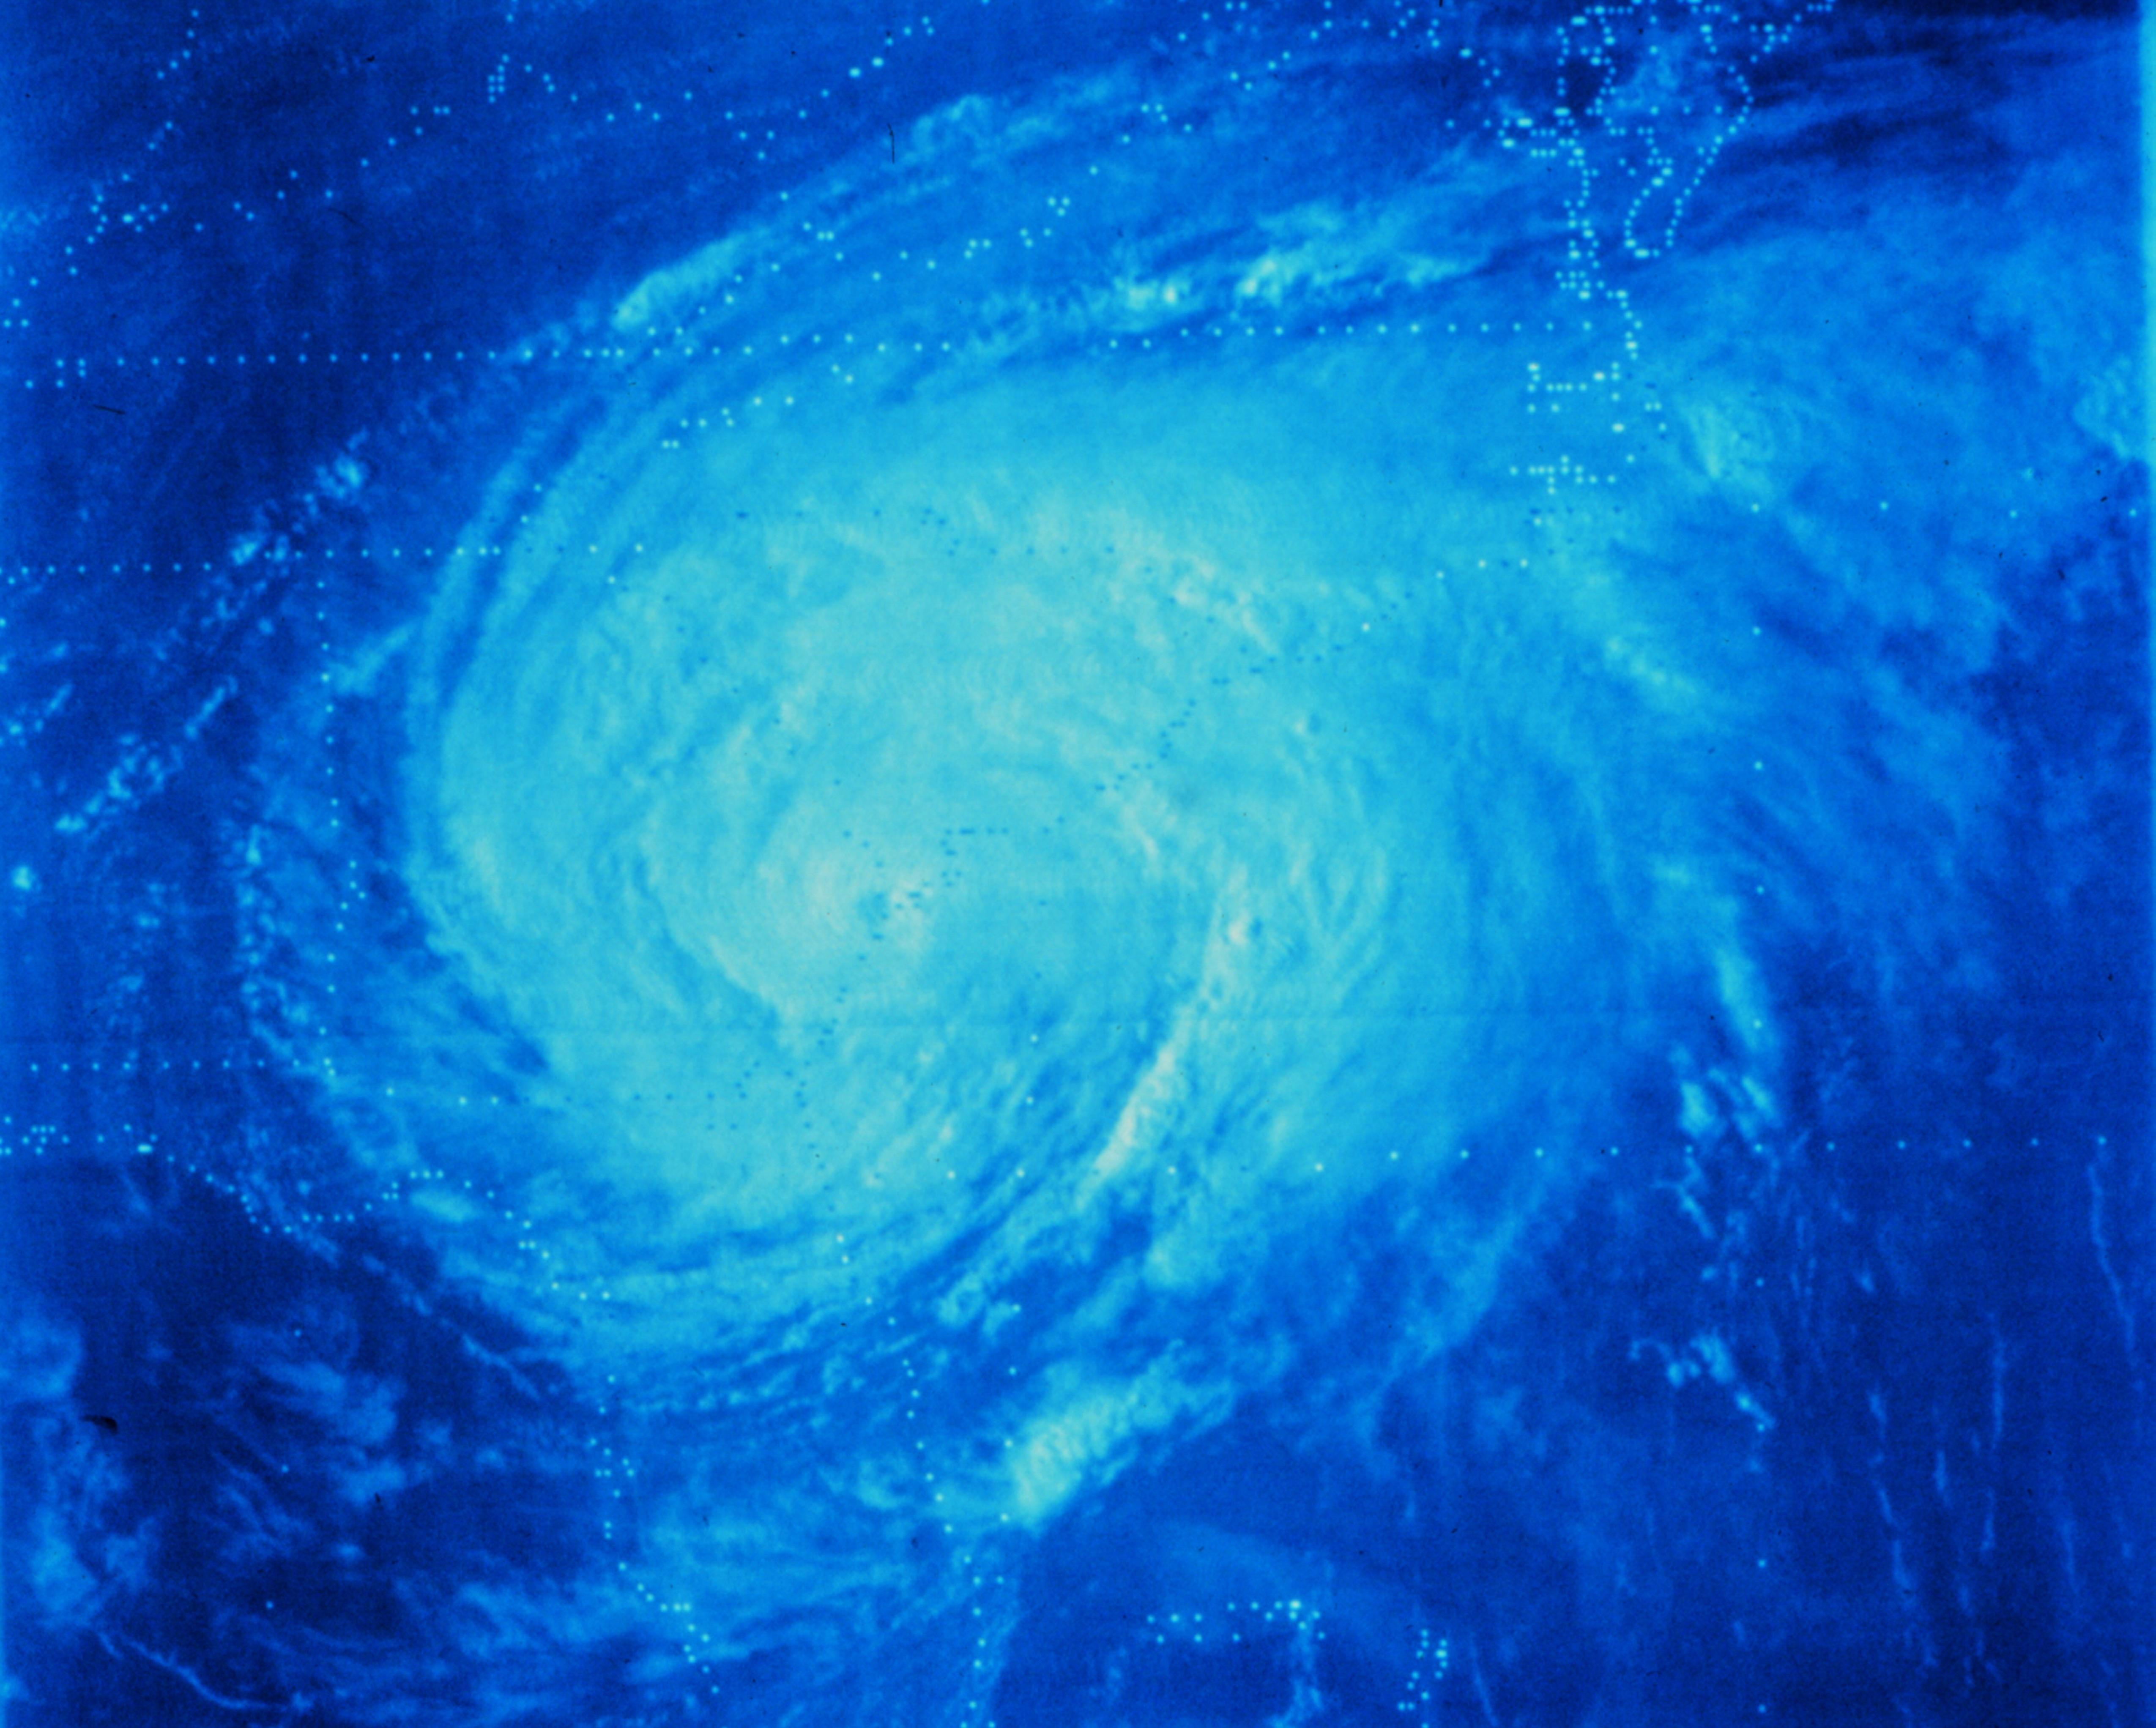 Photograph of Hurricane David making landfall on the Georgia Coast